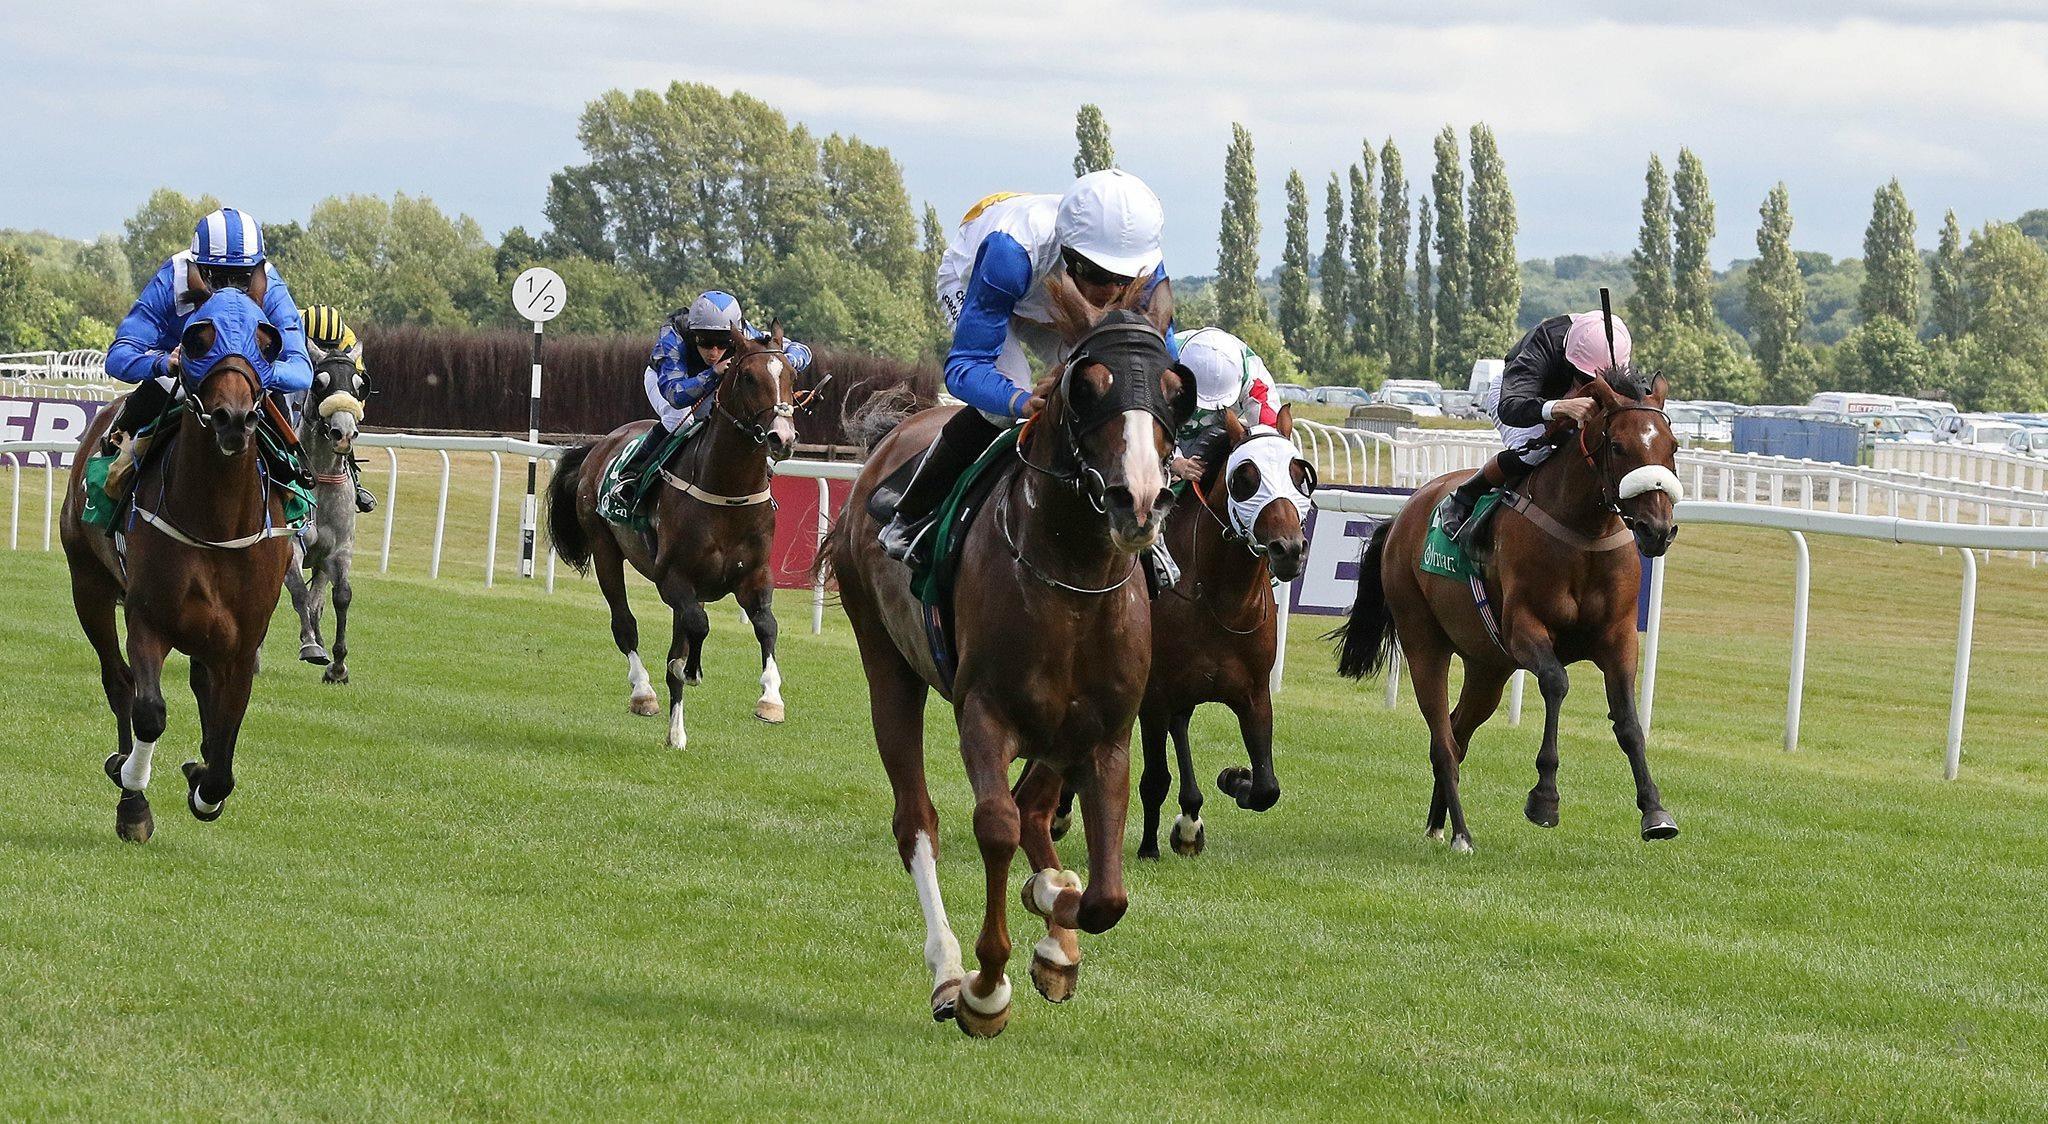 Oman Royal Cavalry's Kowkat wins at newbury